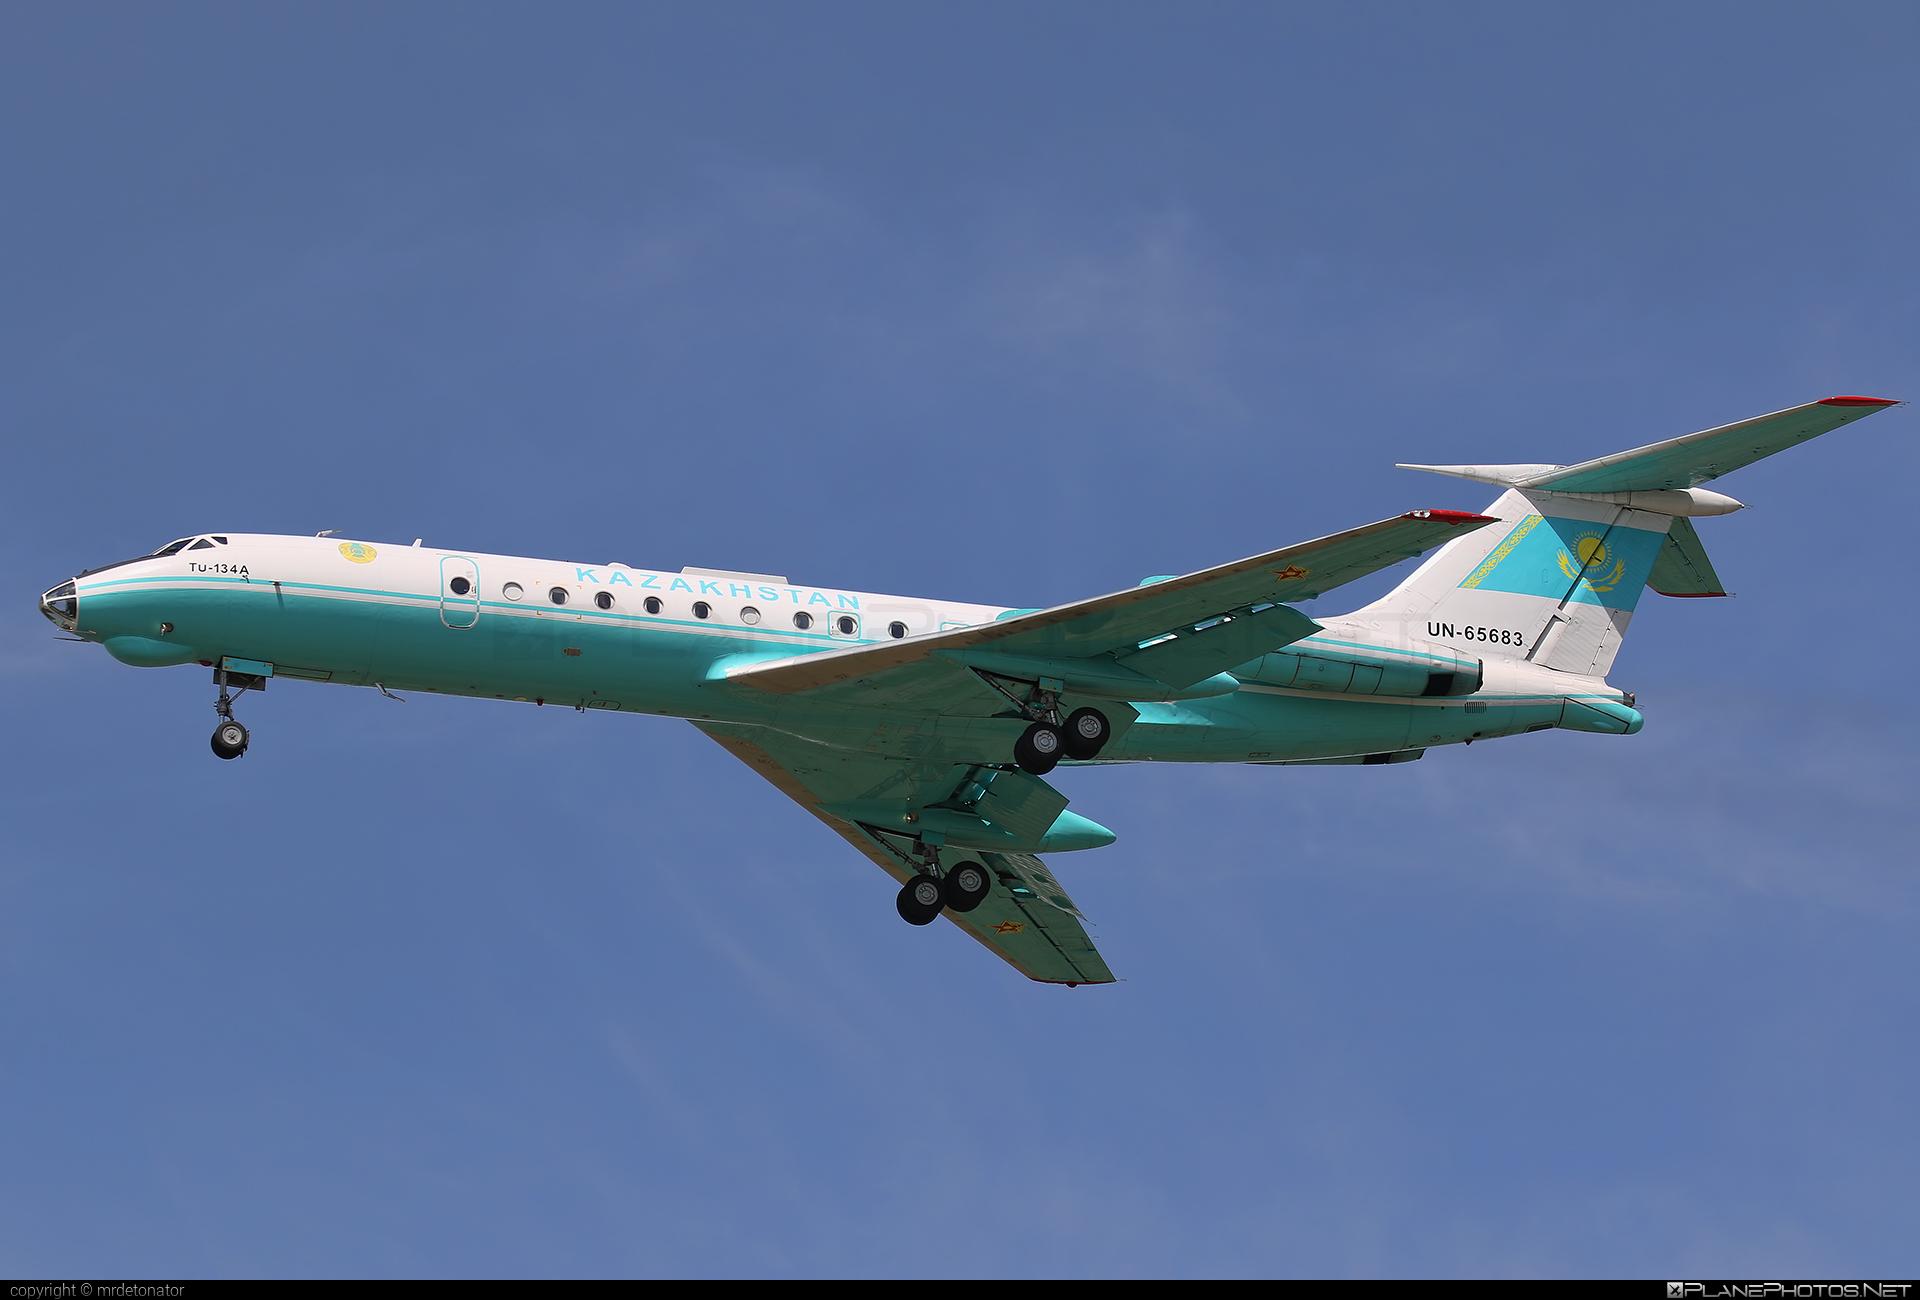 Tupolev Tu-134A - UN-65683 operated by Kazakhstan - Government #tu134 #tu134a #tupolev #tupolev134 #tupolevtu134 #tupolevtu134a